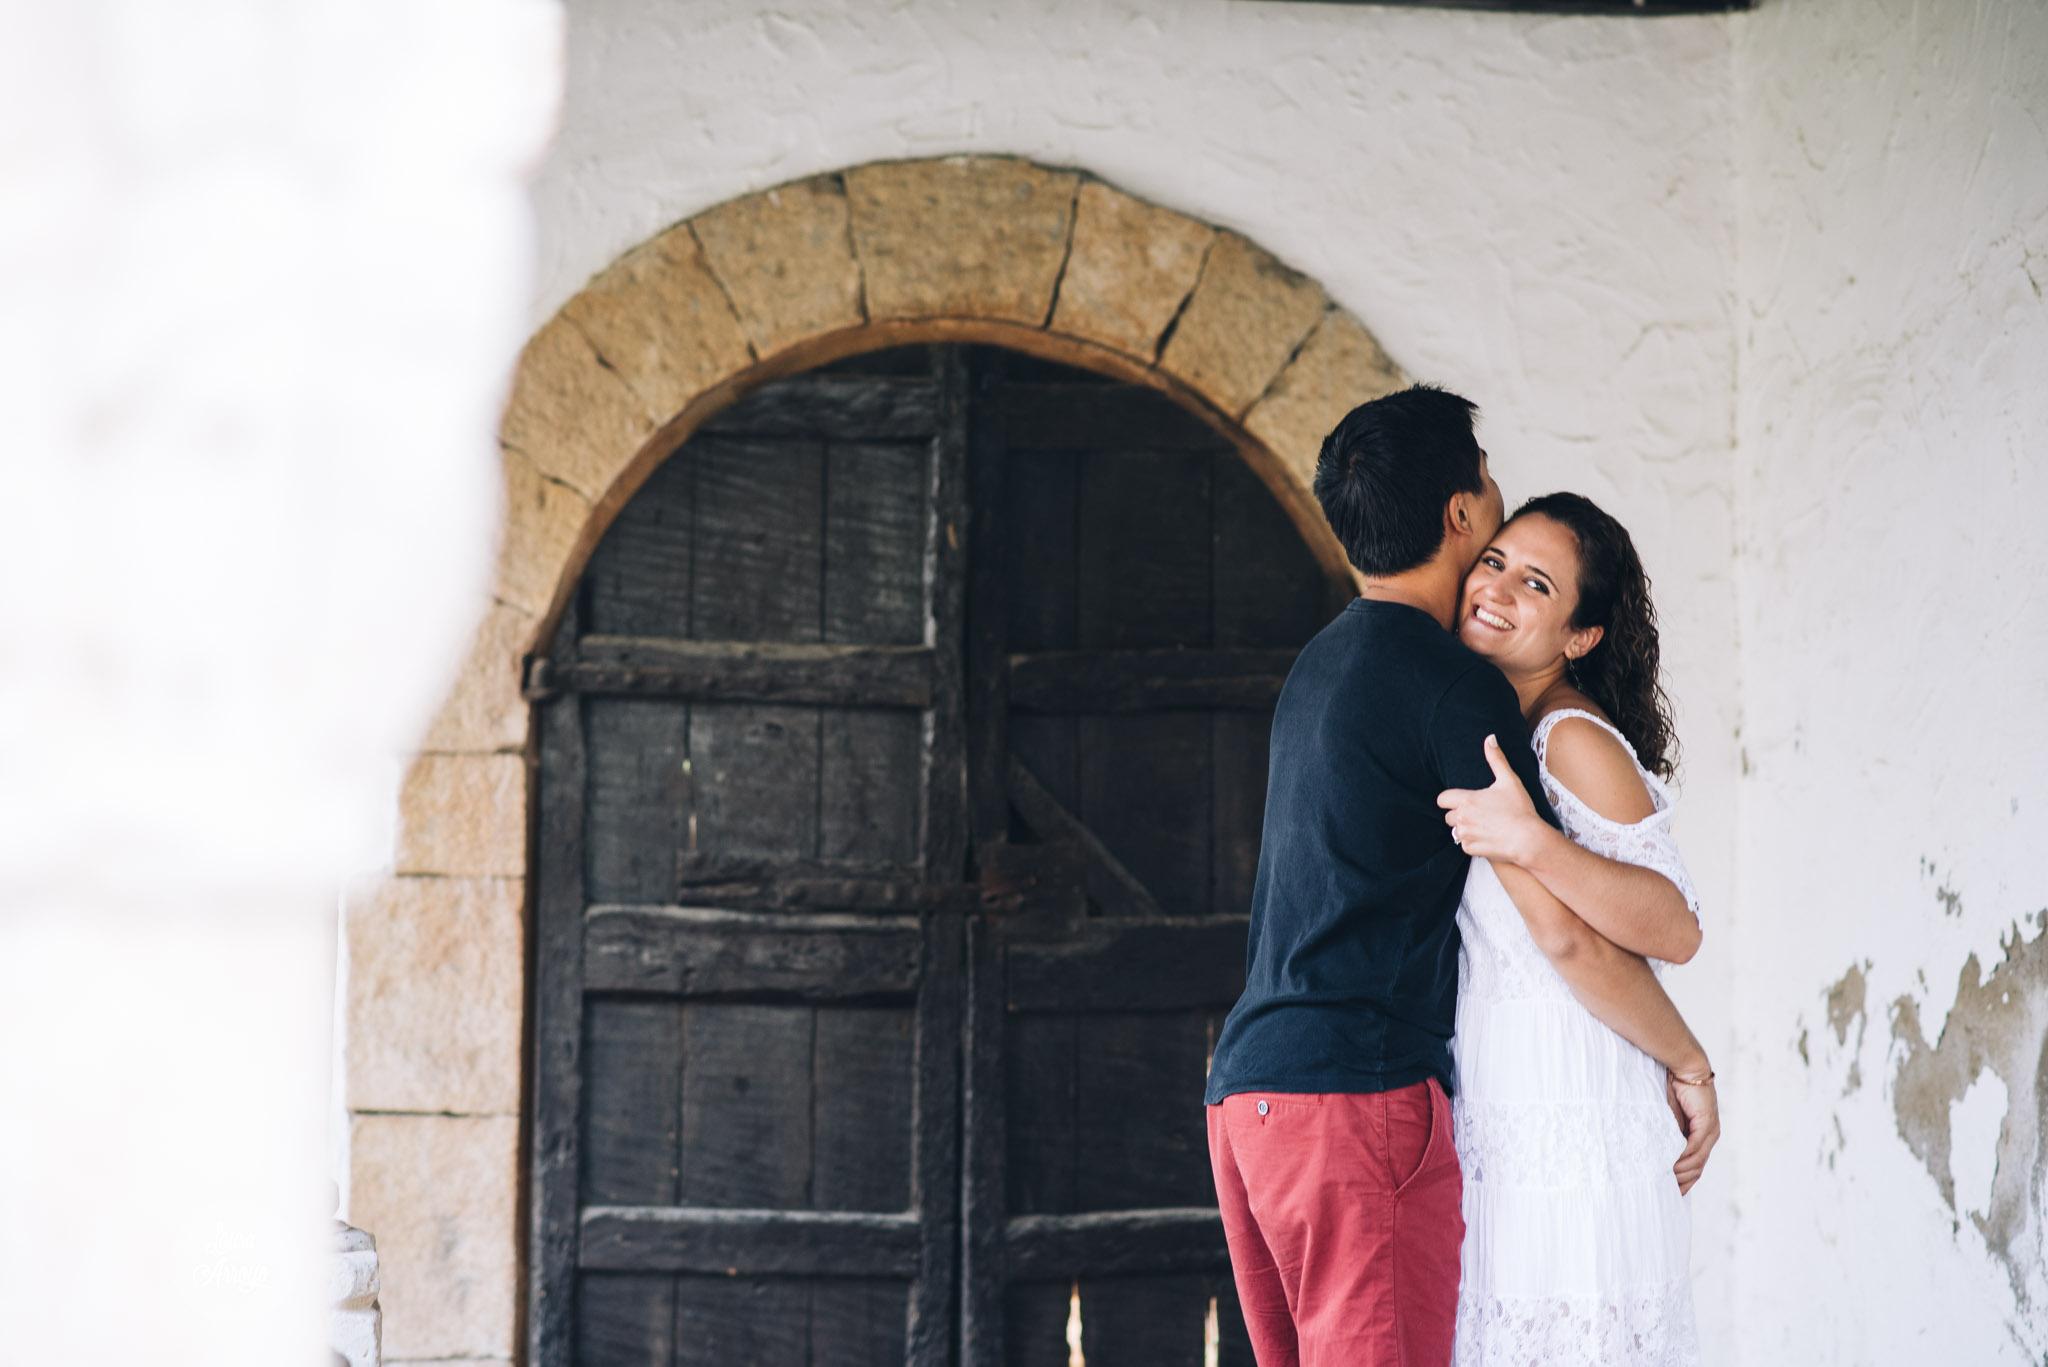 Laura_Arroyo_preboda_-Roc de Sant Gaieta - Tarragona-Fotoperiodismo_de_boda_8598